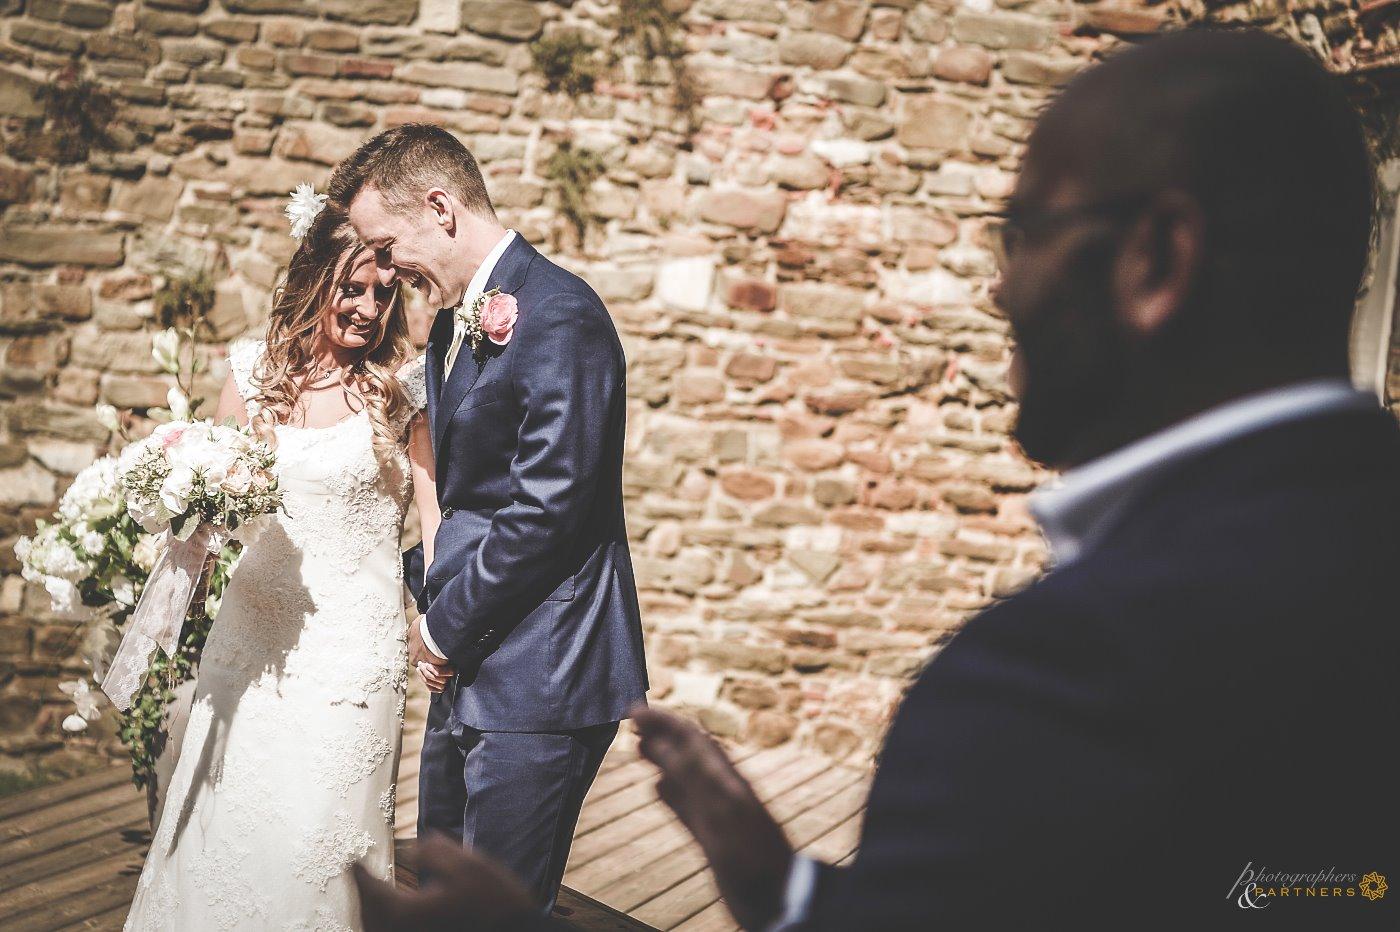 photography_weddings_scarlino_06.jpg